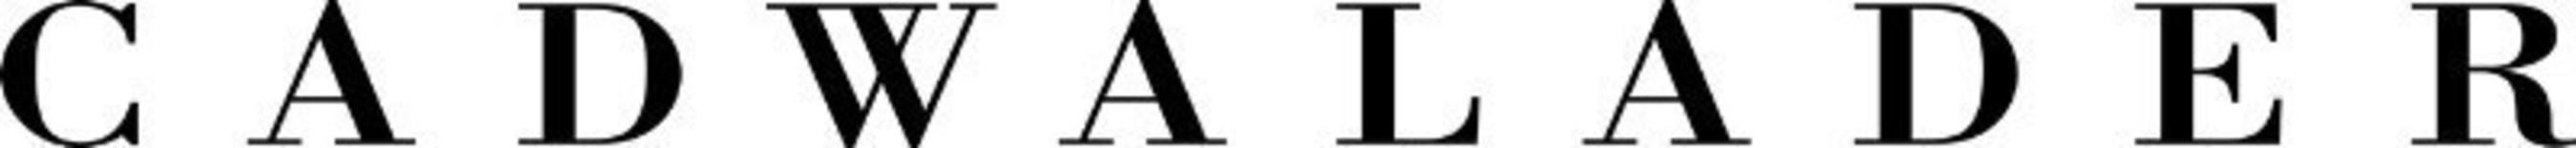 Cadwalader, Wickersham & Taft Logo (PRNewsFoto/Cadwalader, Wickersham & Taft L)